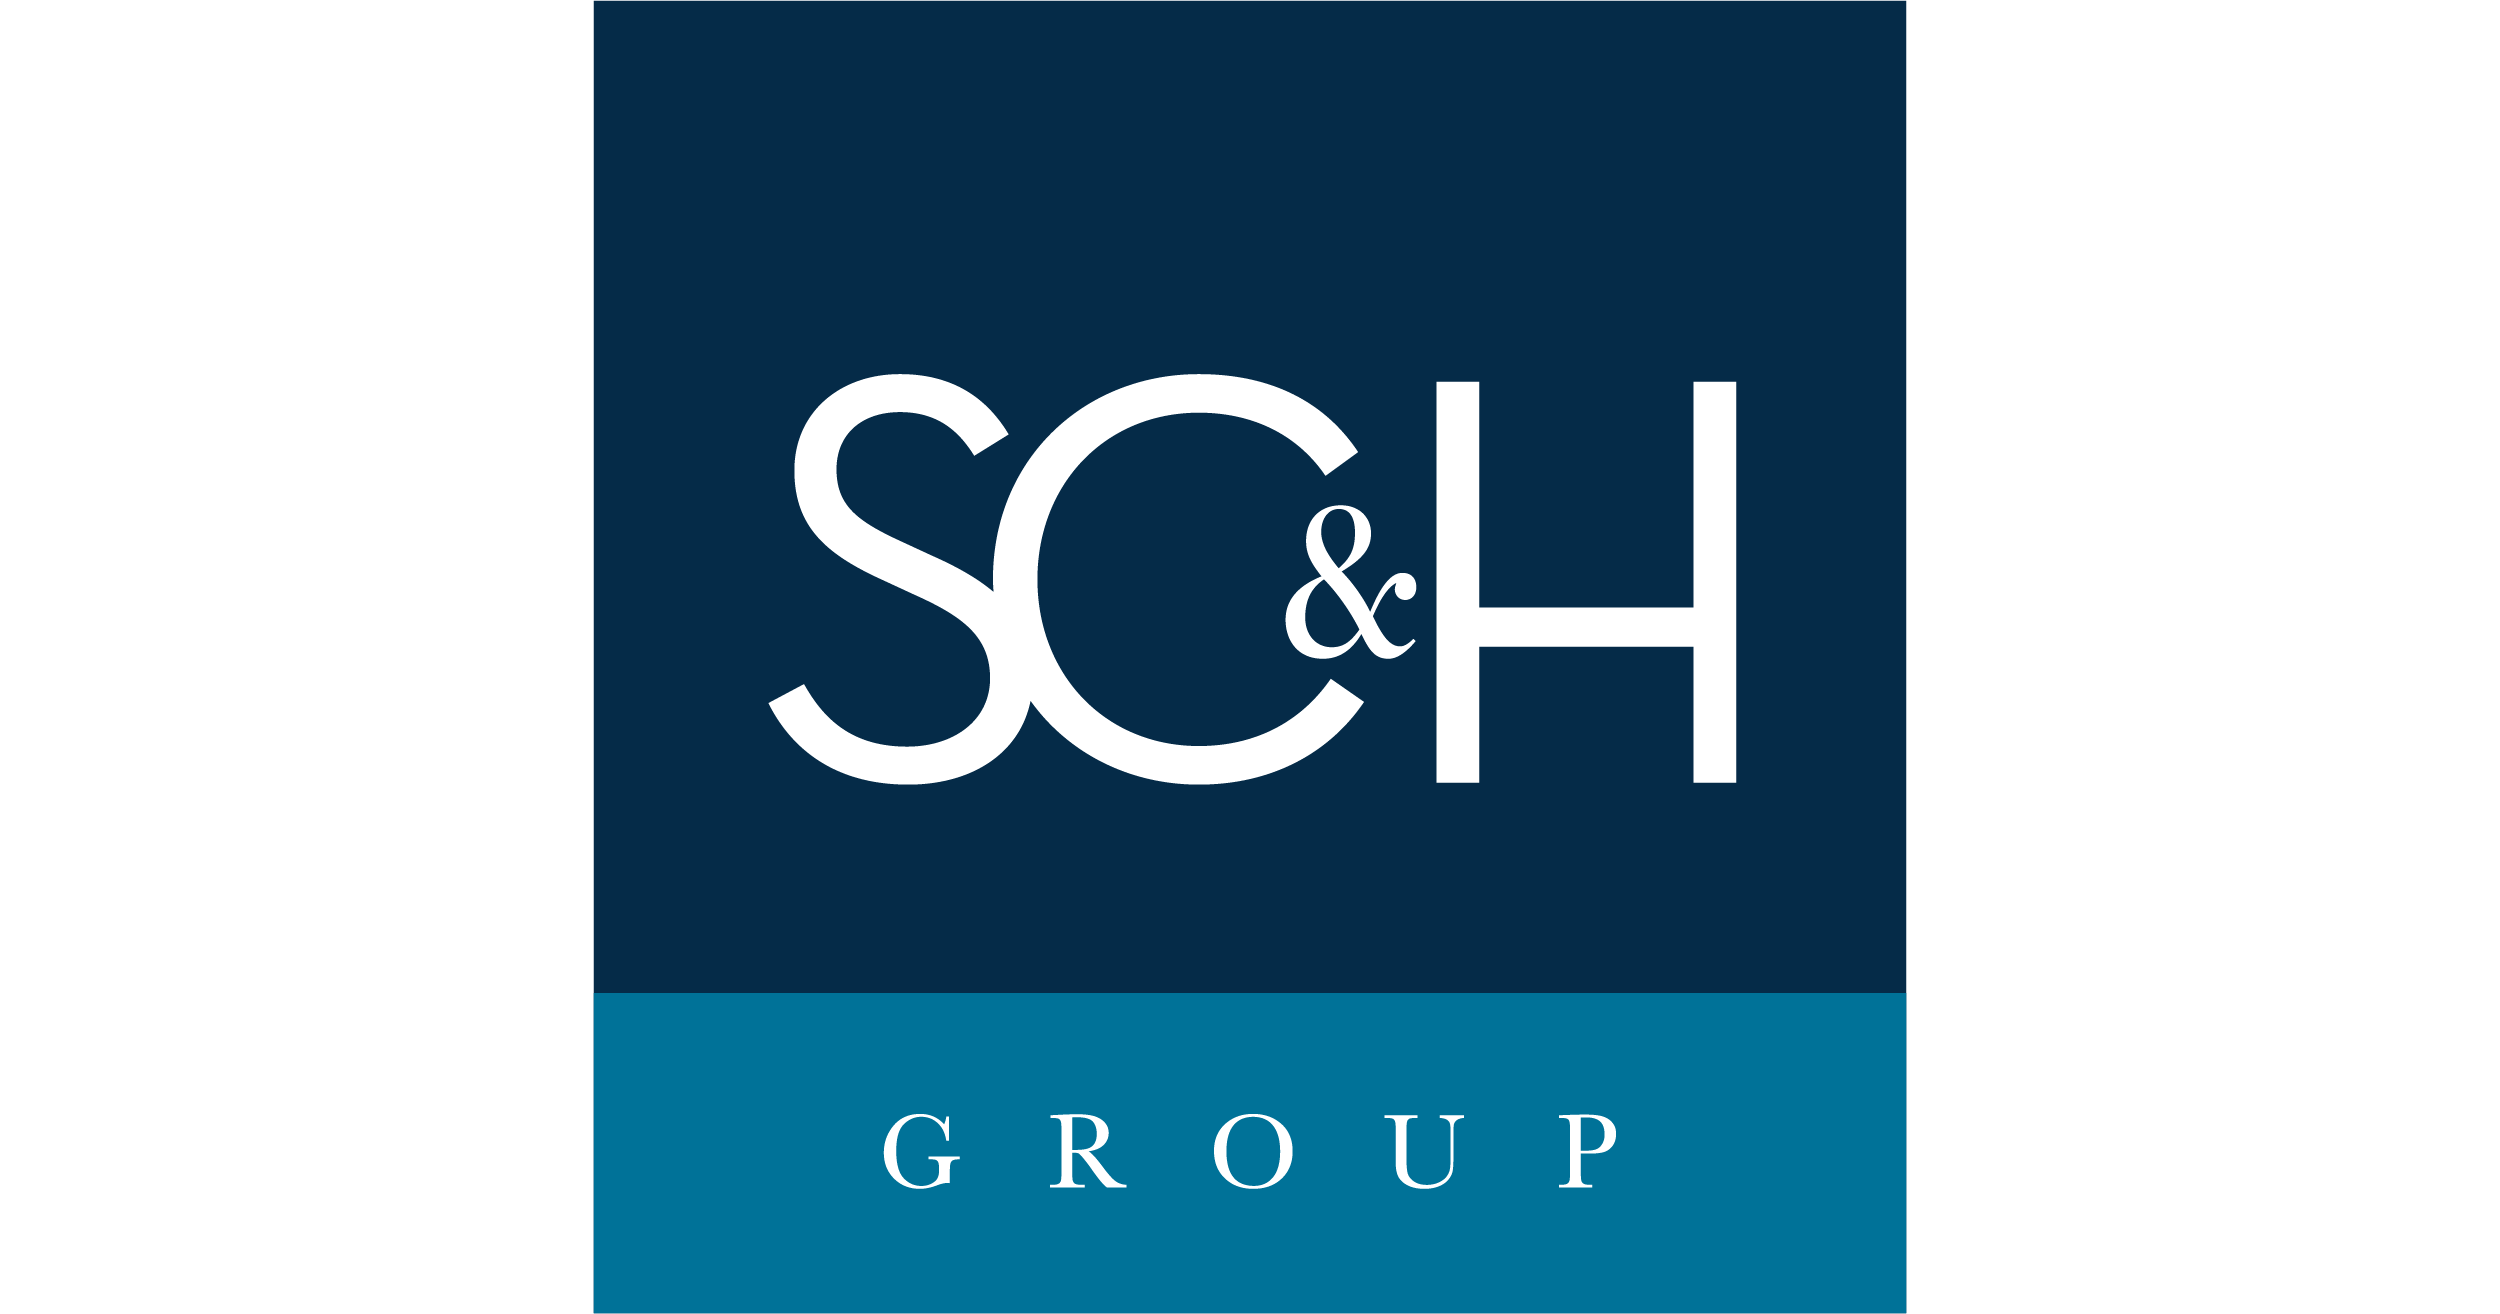 SCH-Group-Logo-2018